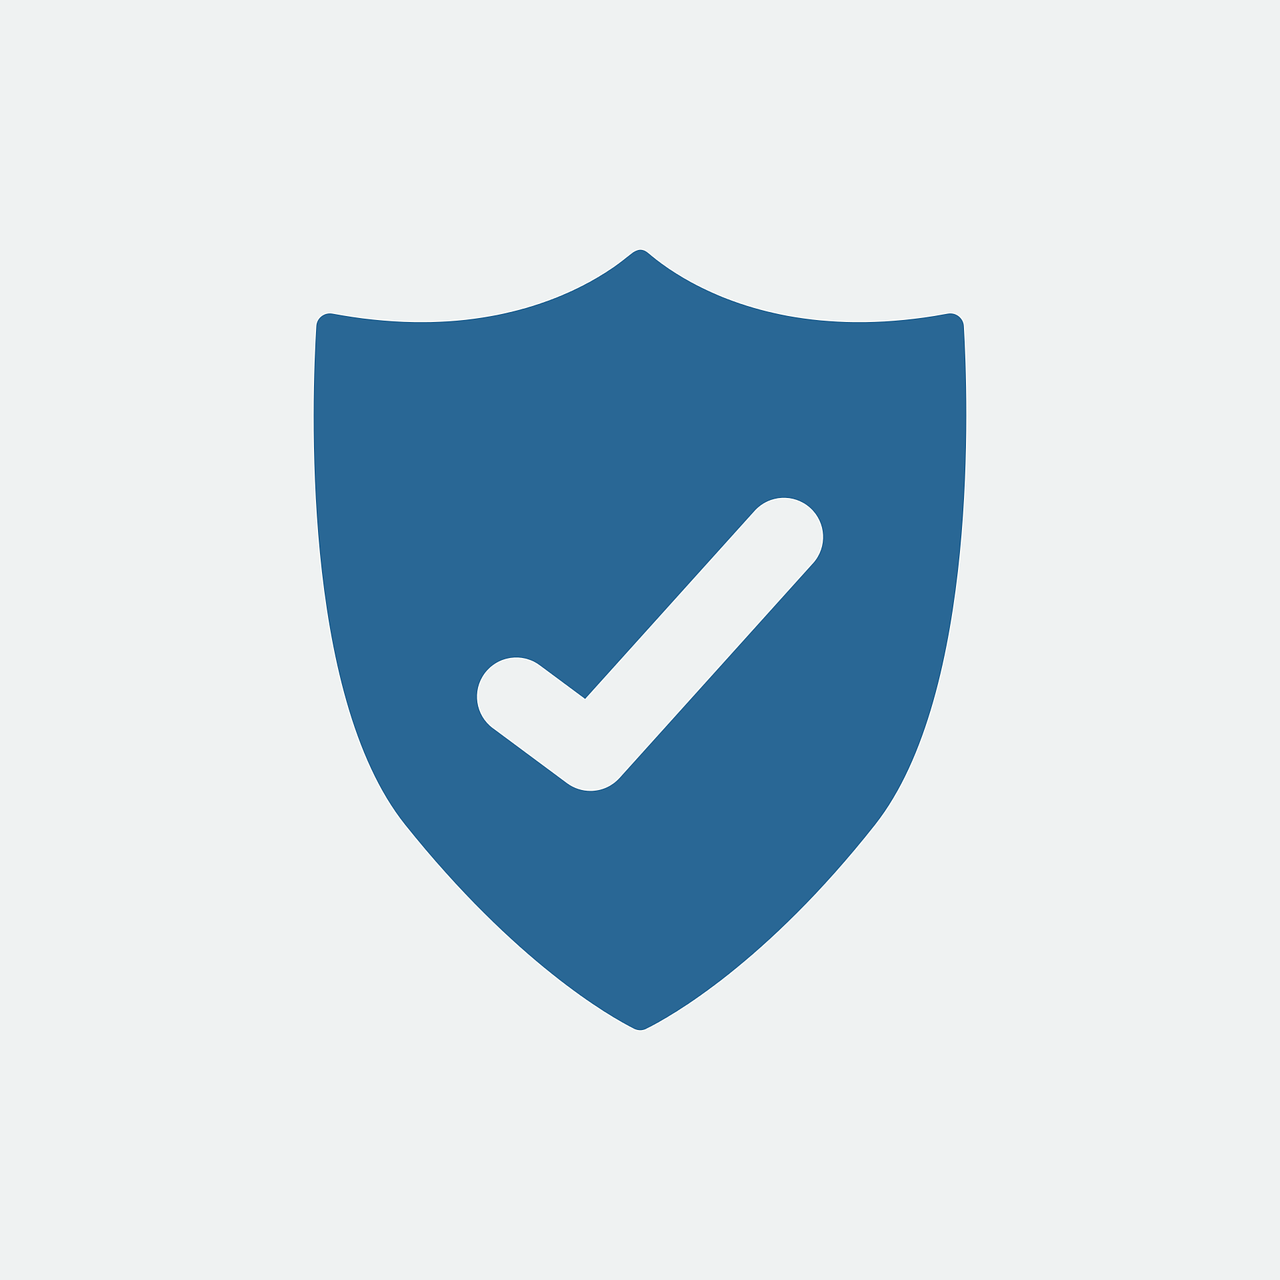 PC-protection-and-maintenance-toledo-ohio